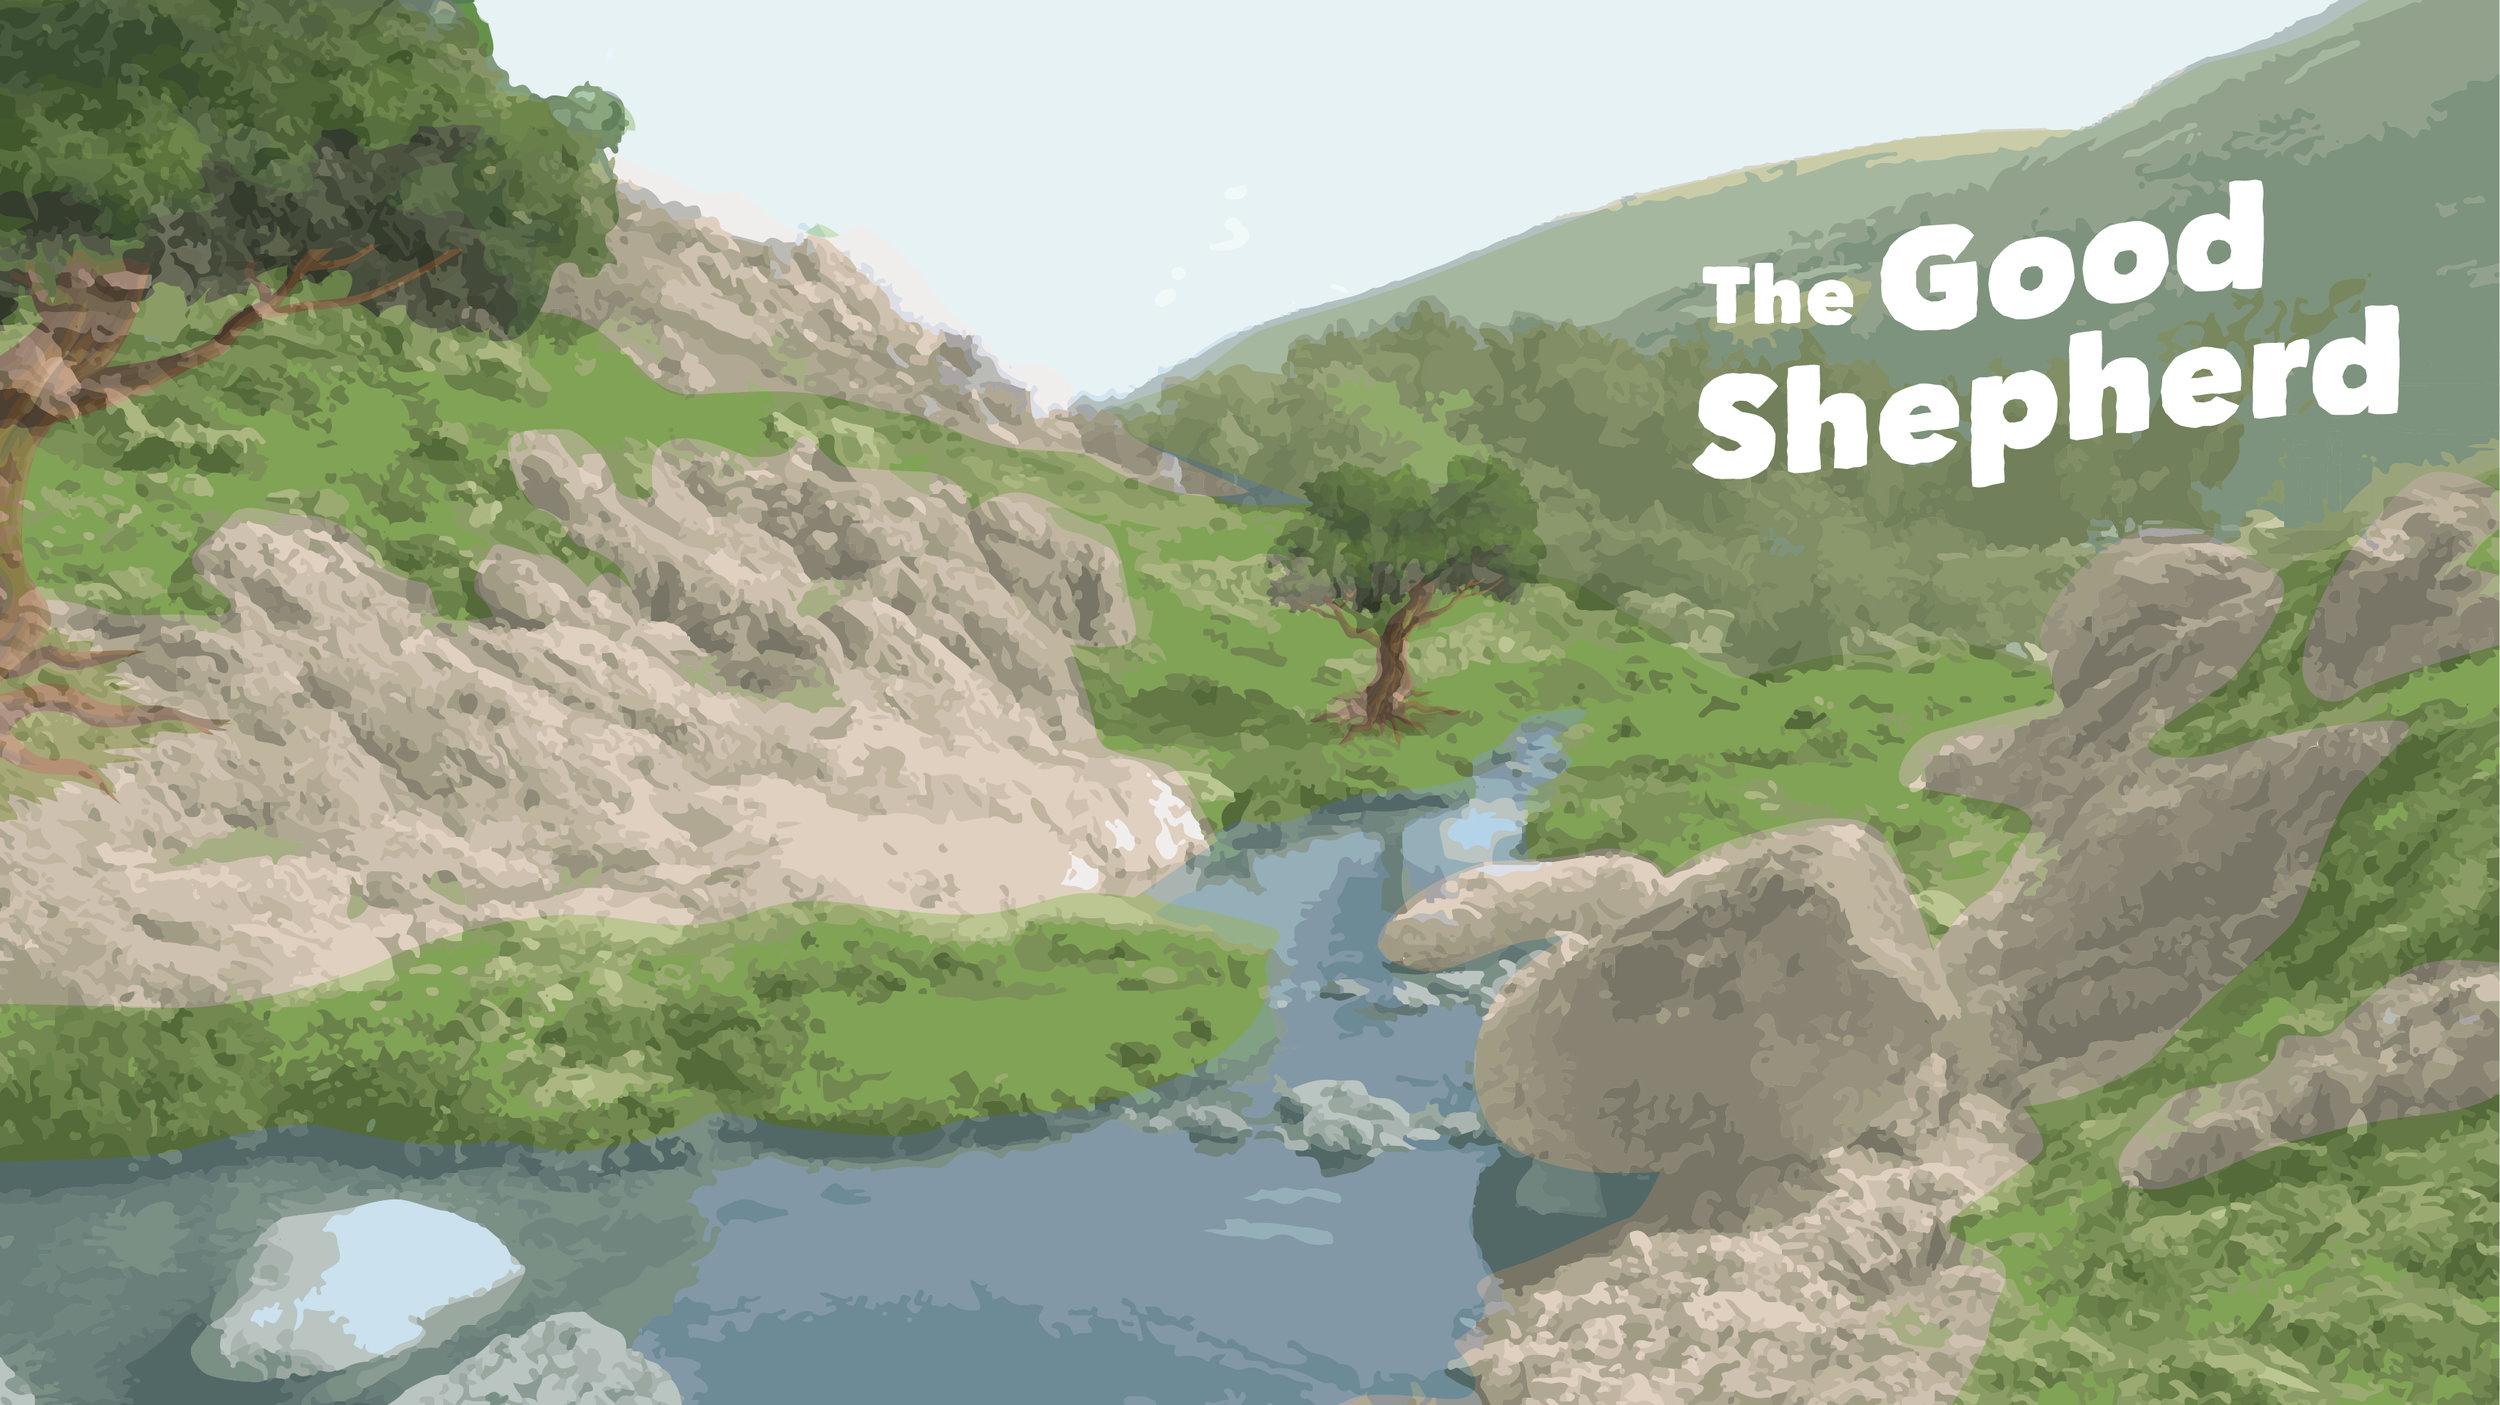 good-shepherd-02.jpg